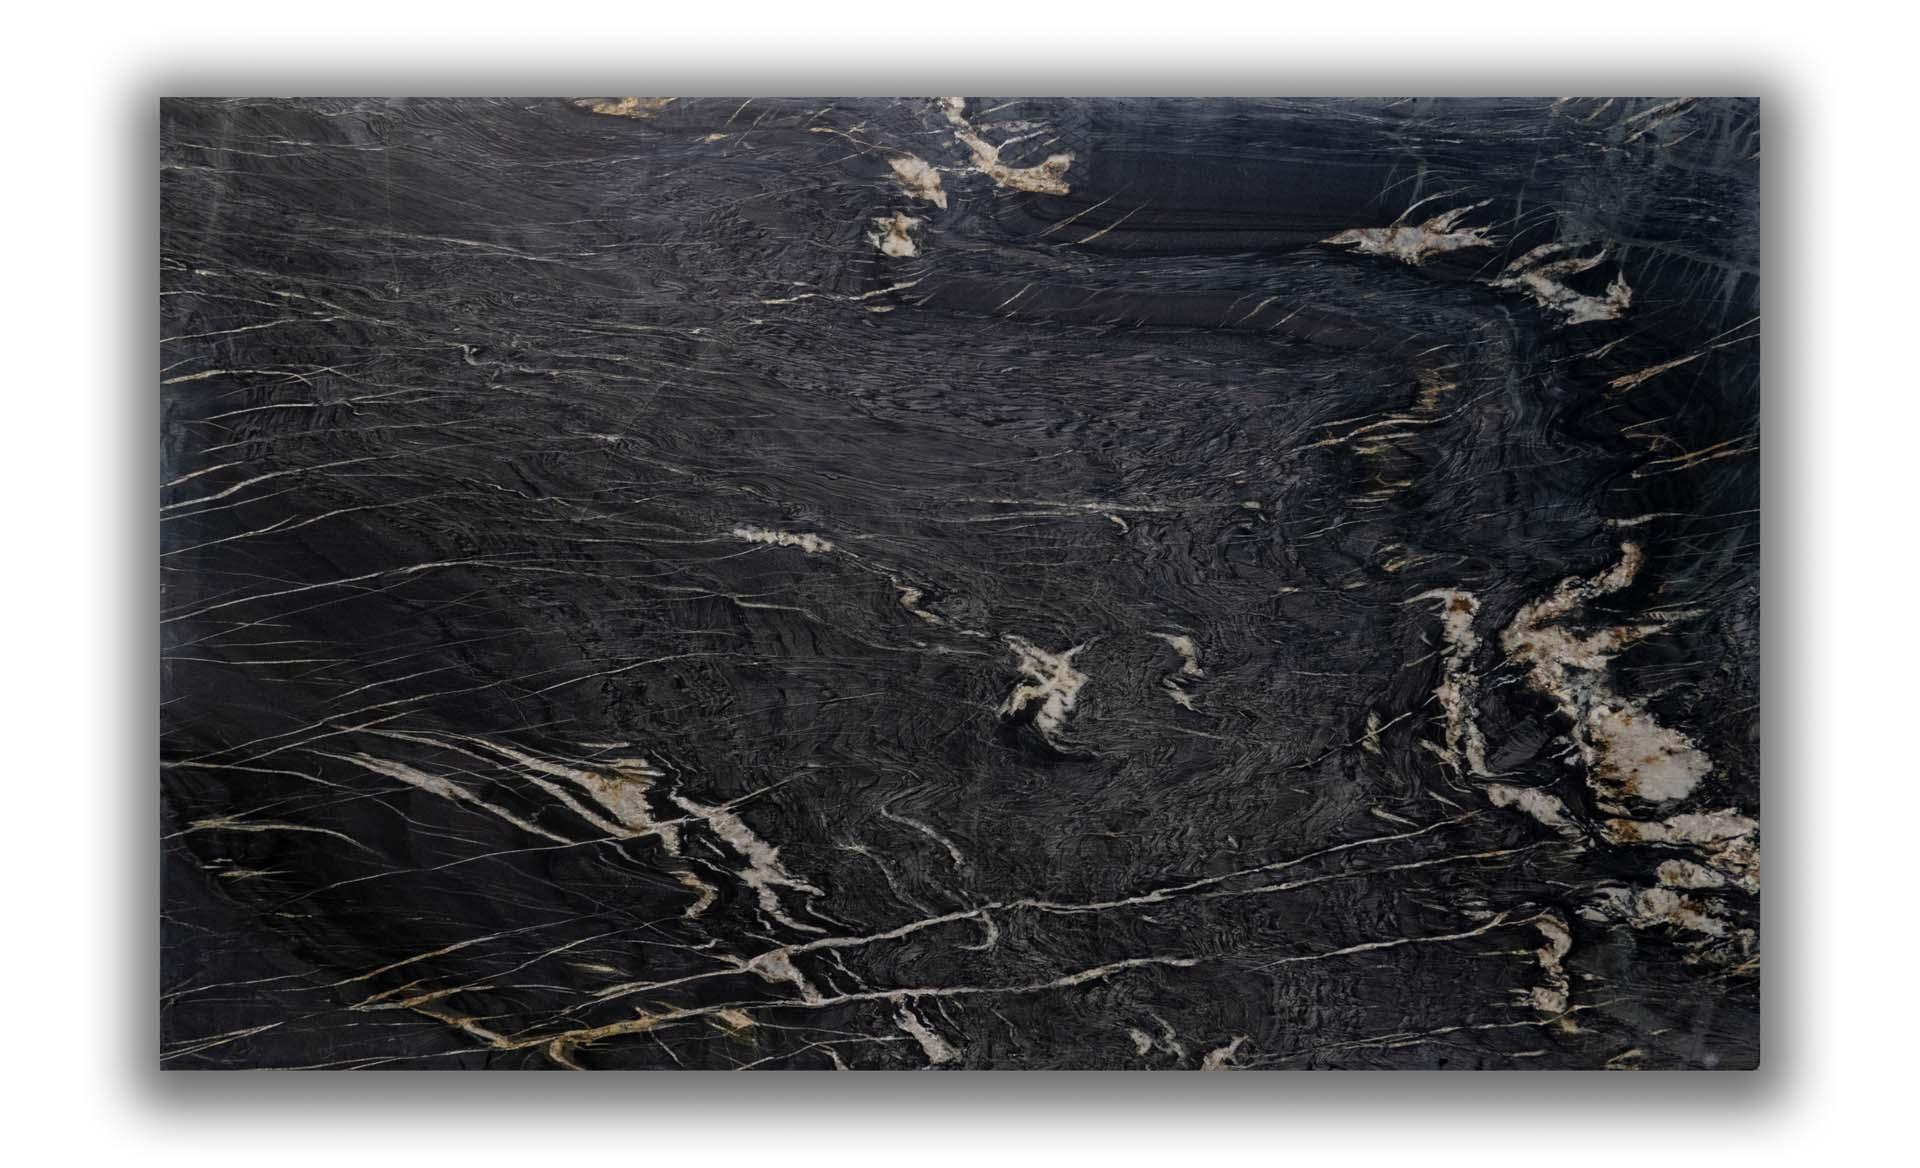 Belvedere Granite Leather Finish SW190312 35113 134222a backdrop